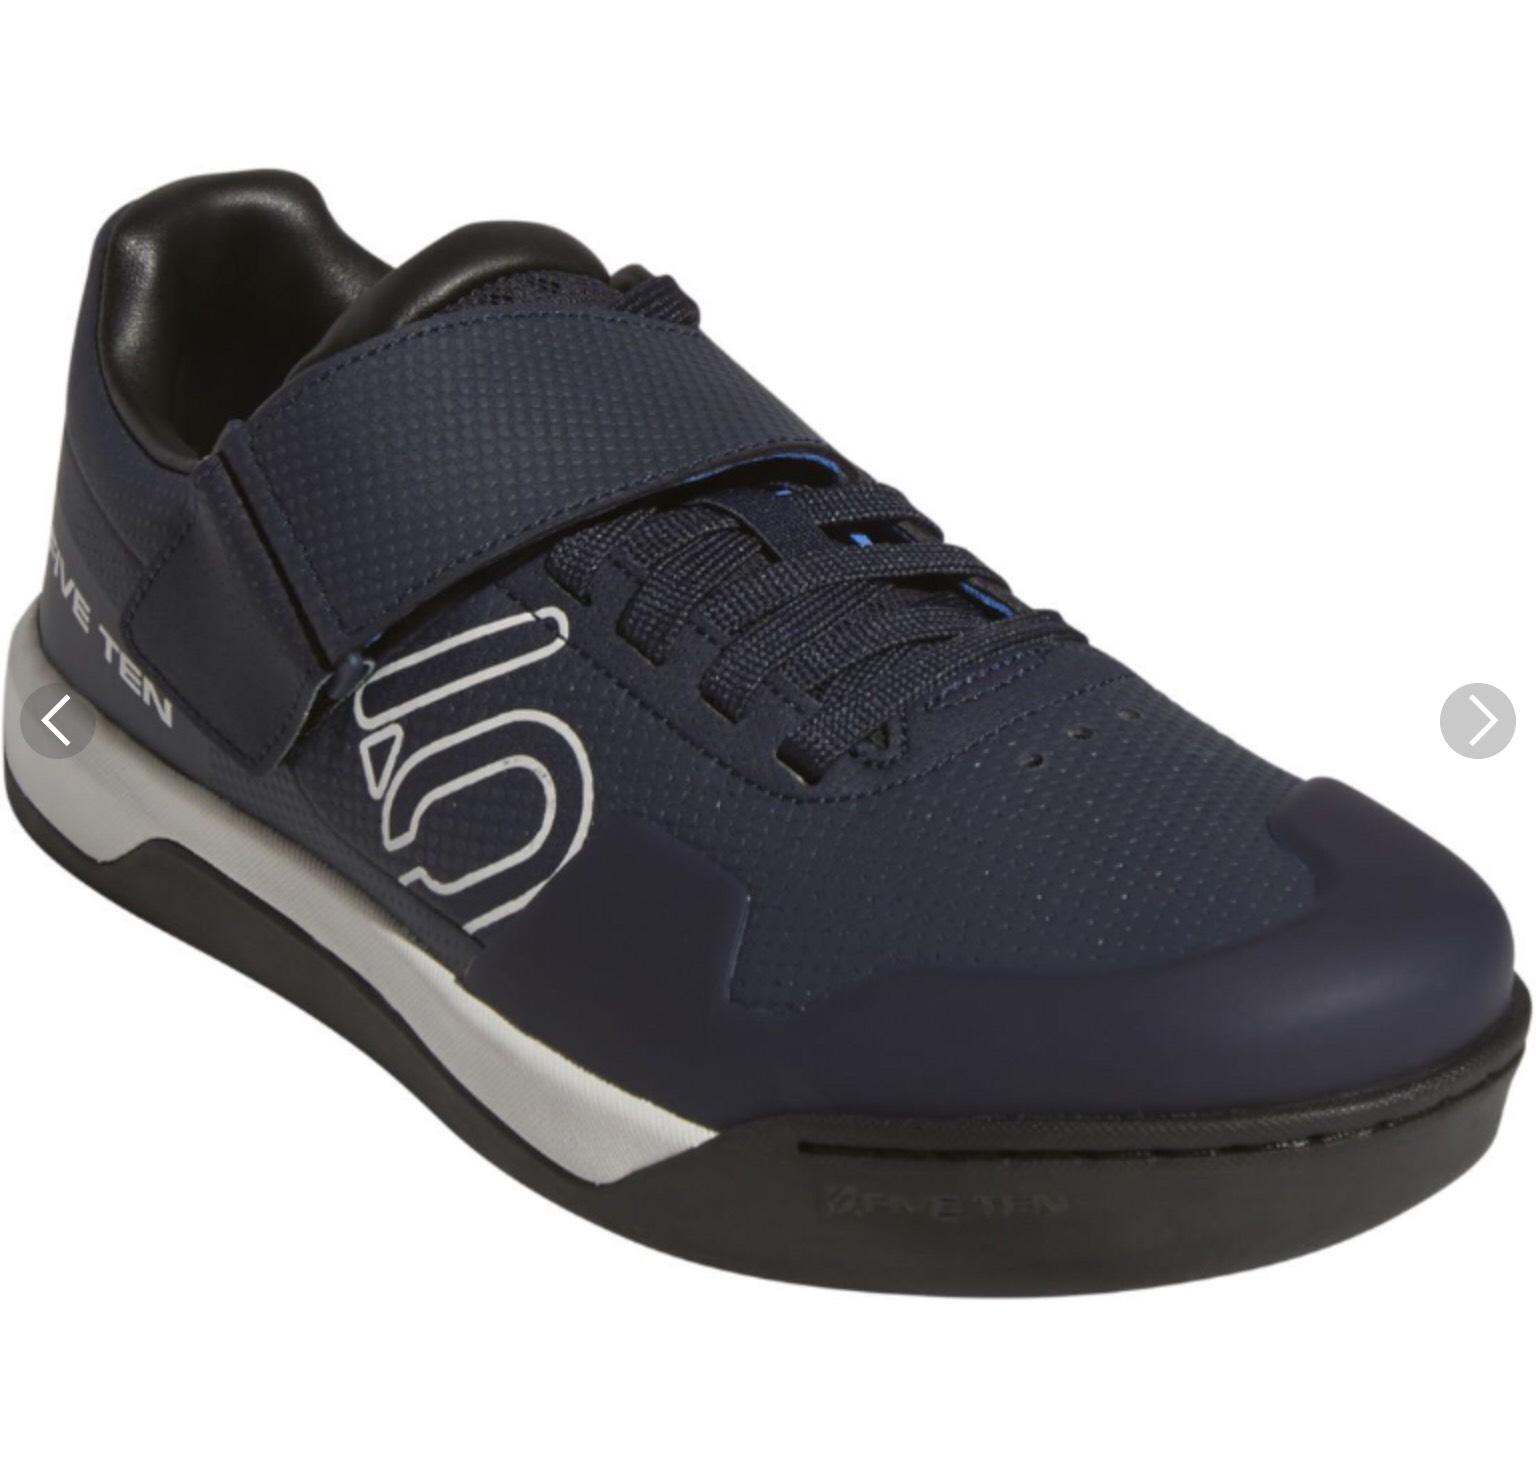 Five ten hellcat pro SPD MTB Shoes (UK5.5-12) navy blue - £60.99 @ chain reaction